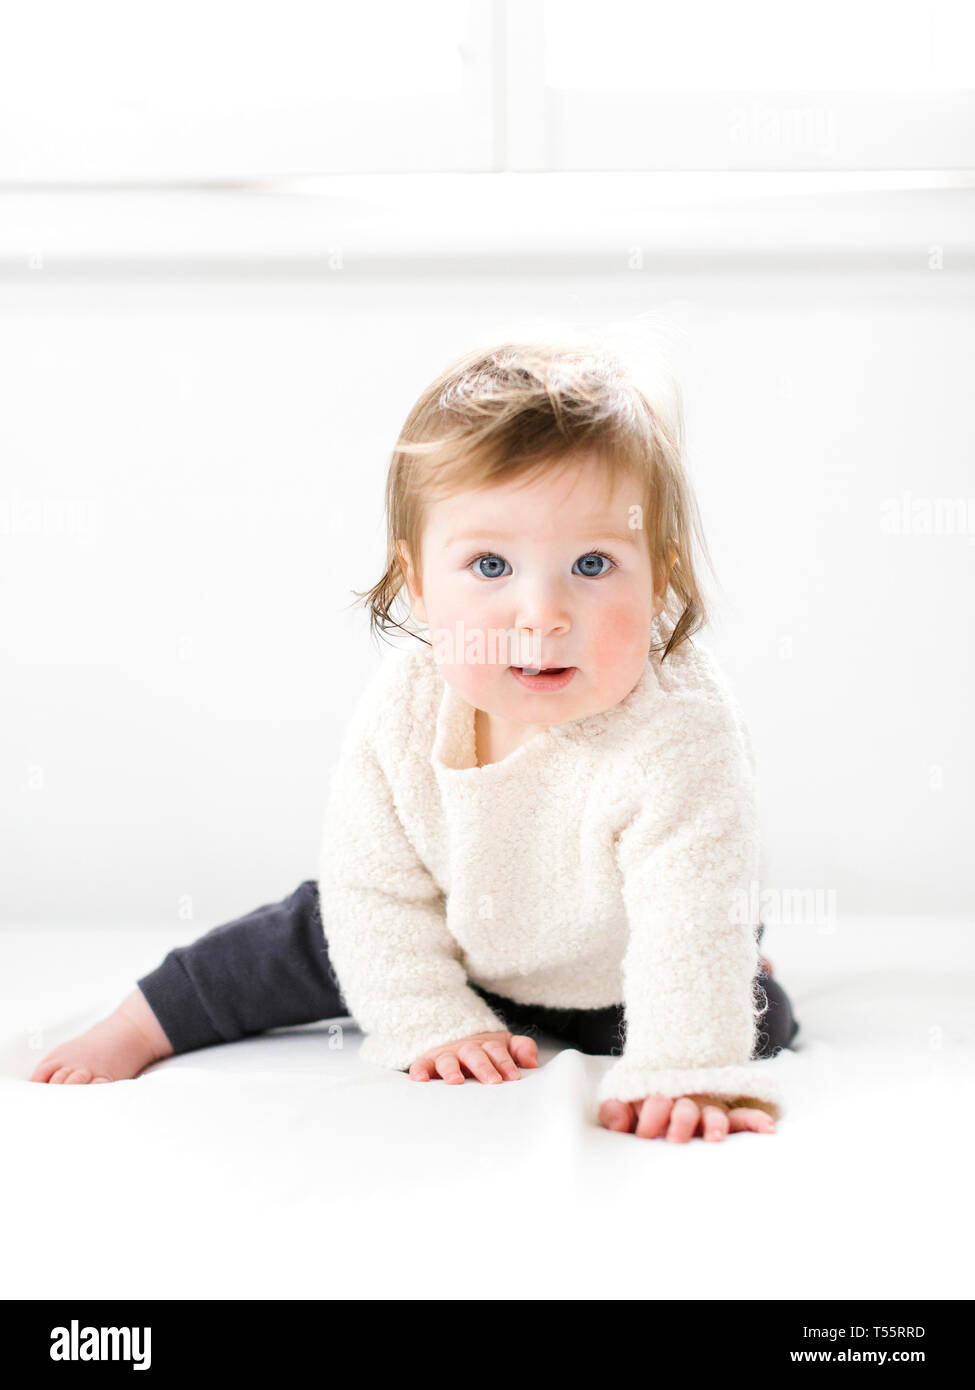 Baby girl wearing white sweater - Stock Image